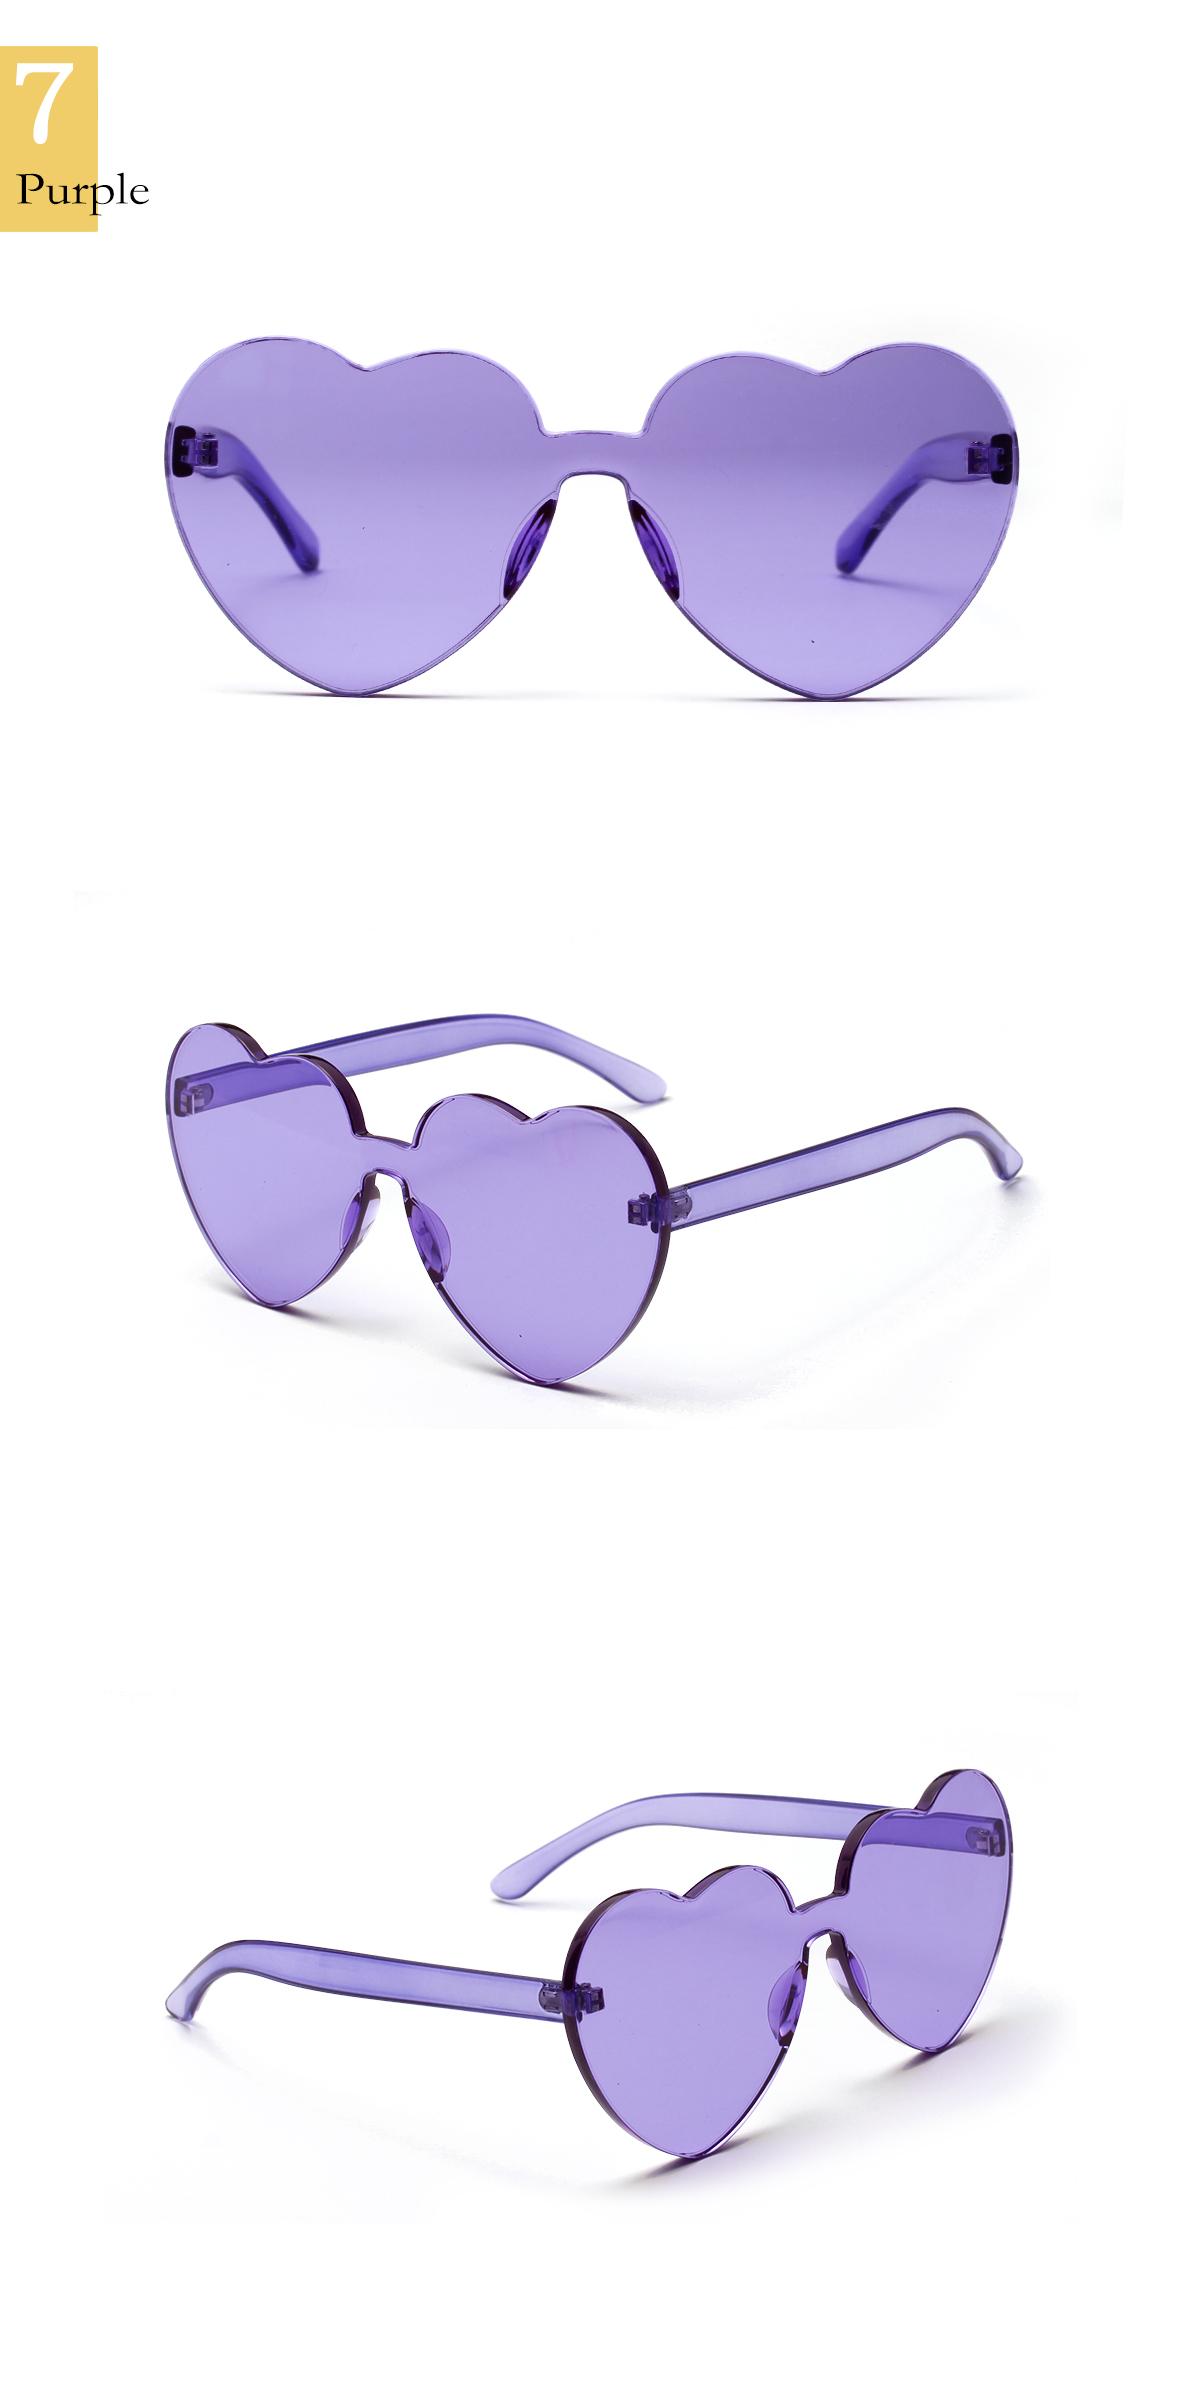 rimless one piece transparent lens sunglasses heart shape peach shape colorful sun glasses